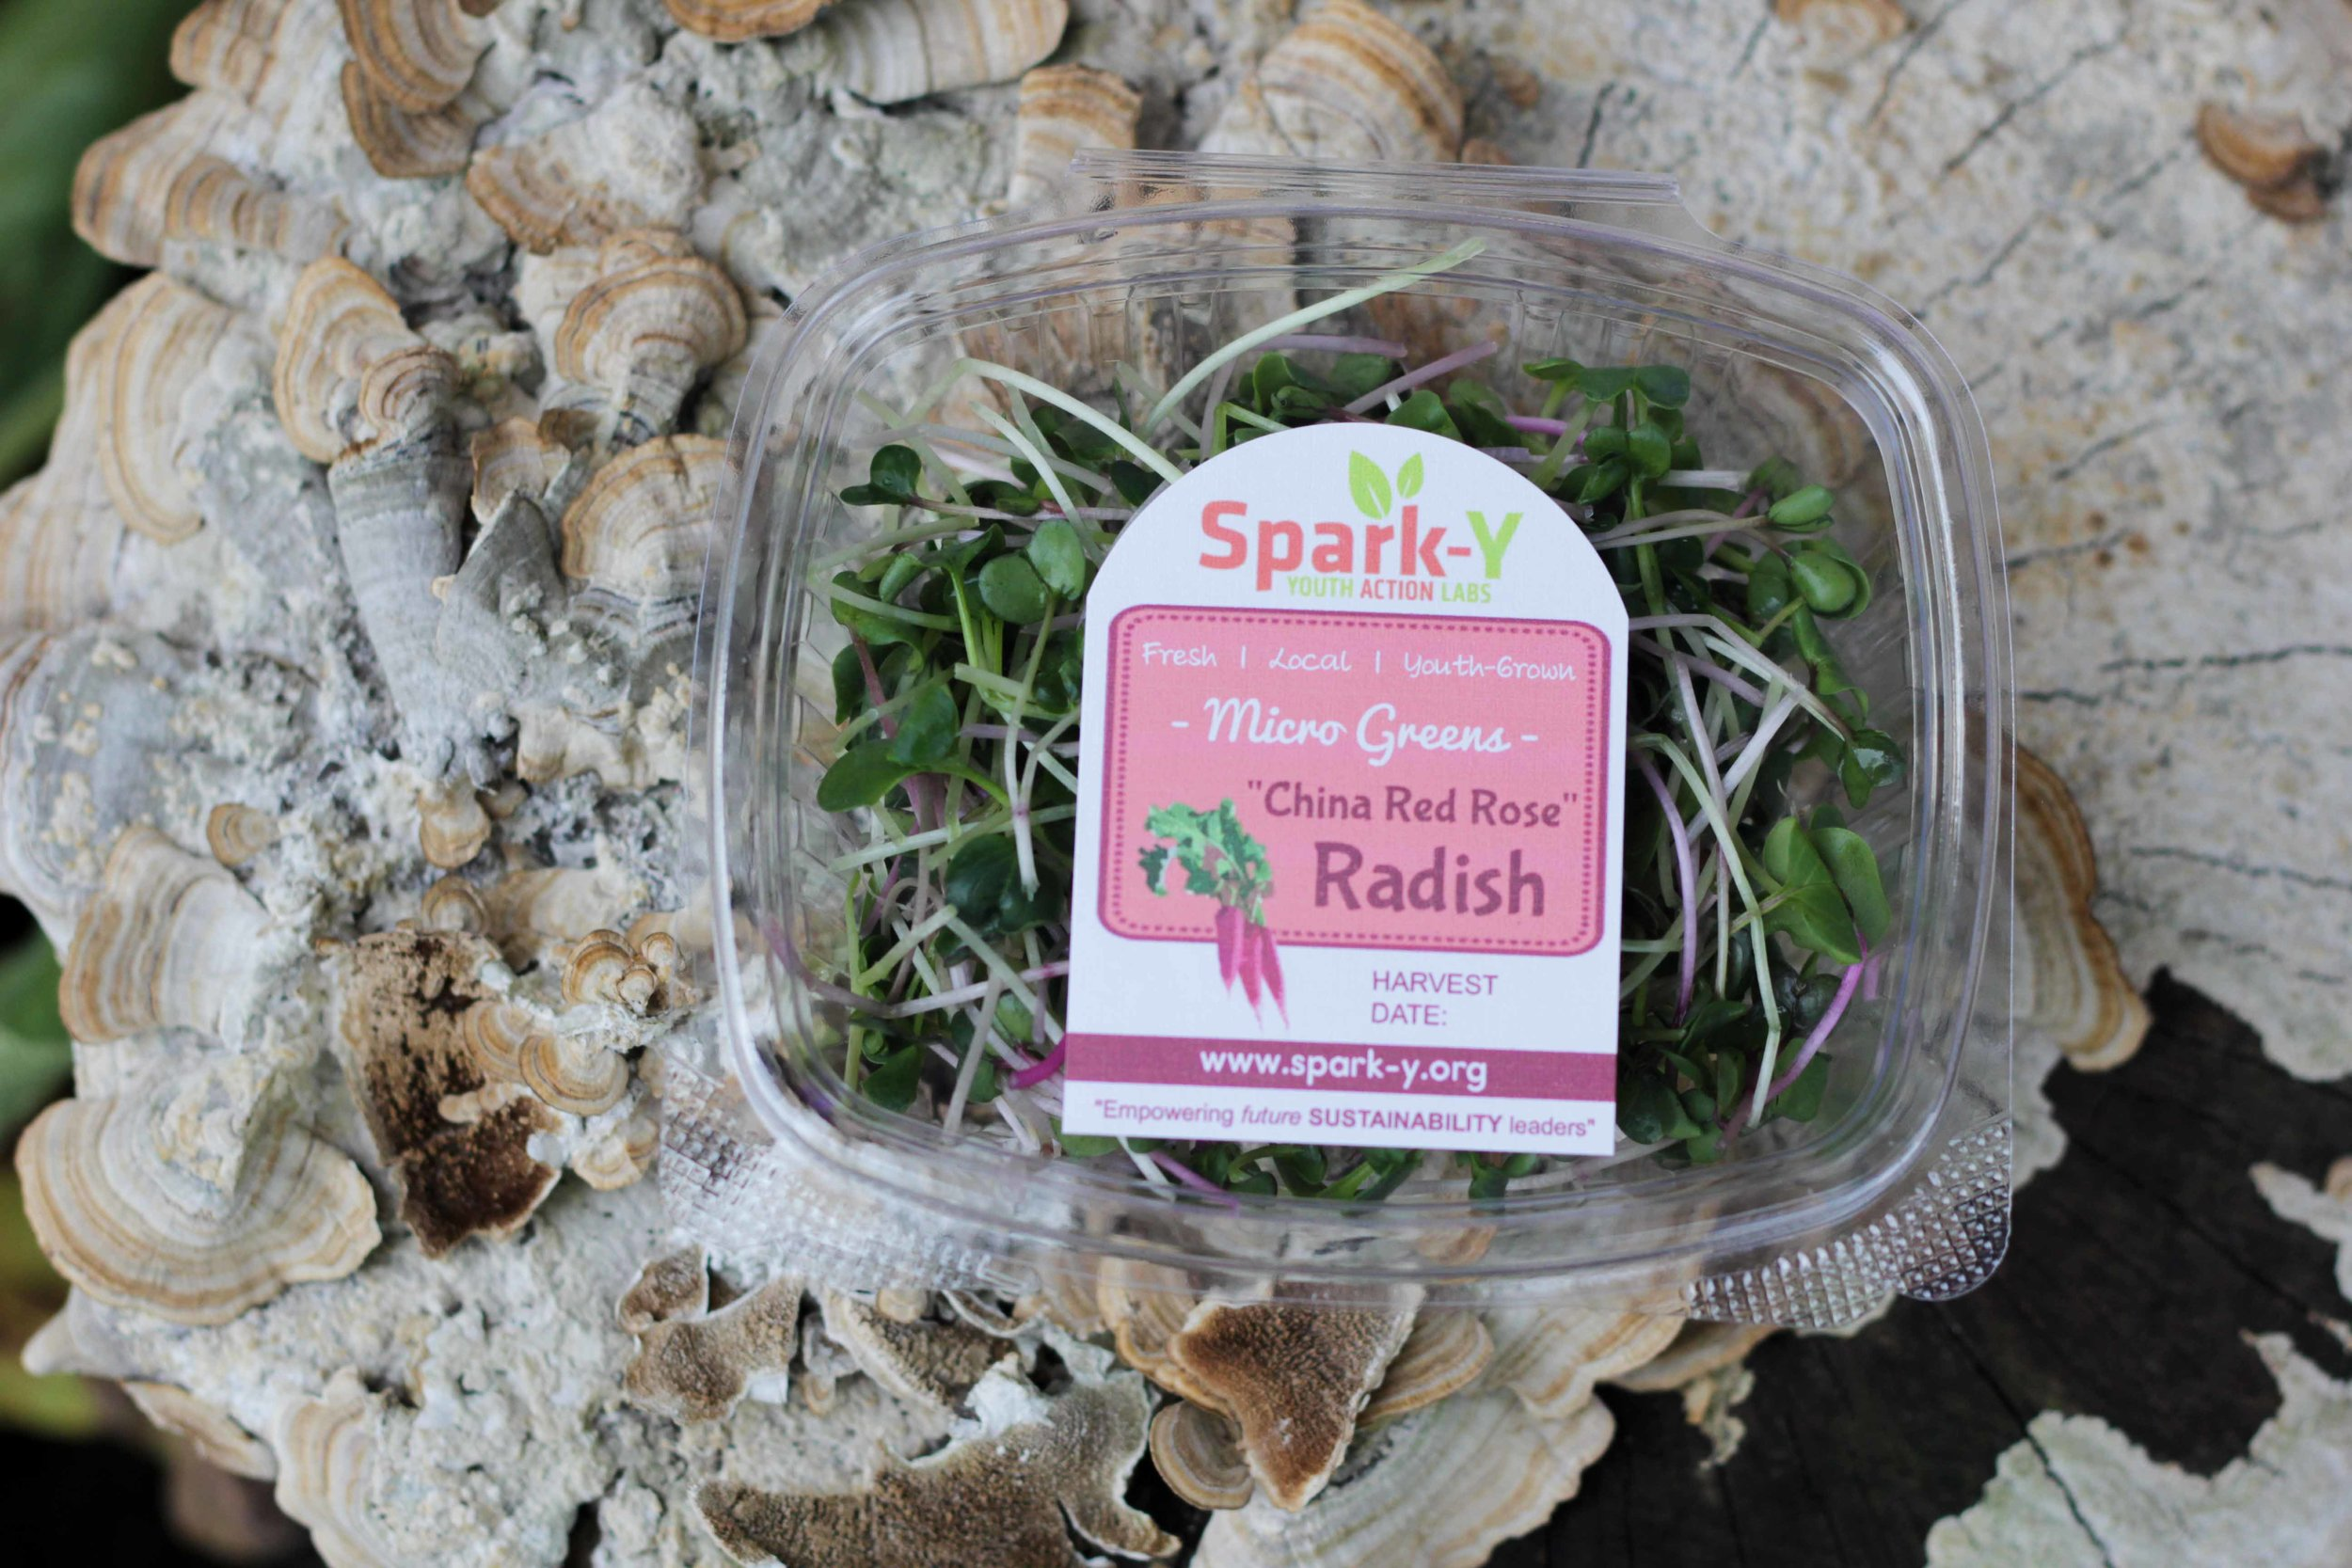 Spark-Y Microgreens -